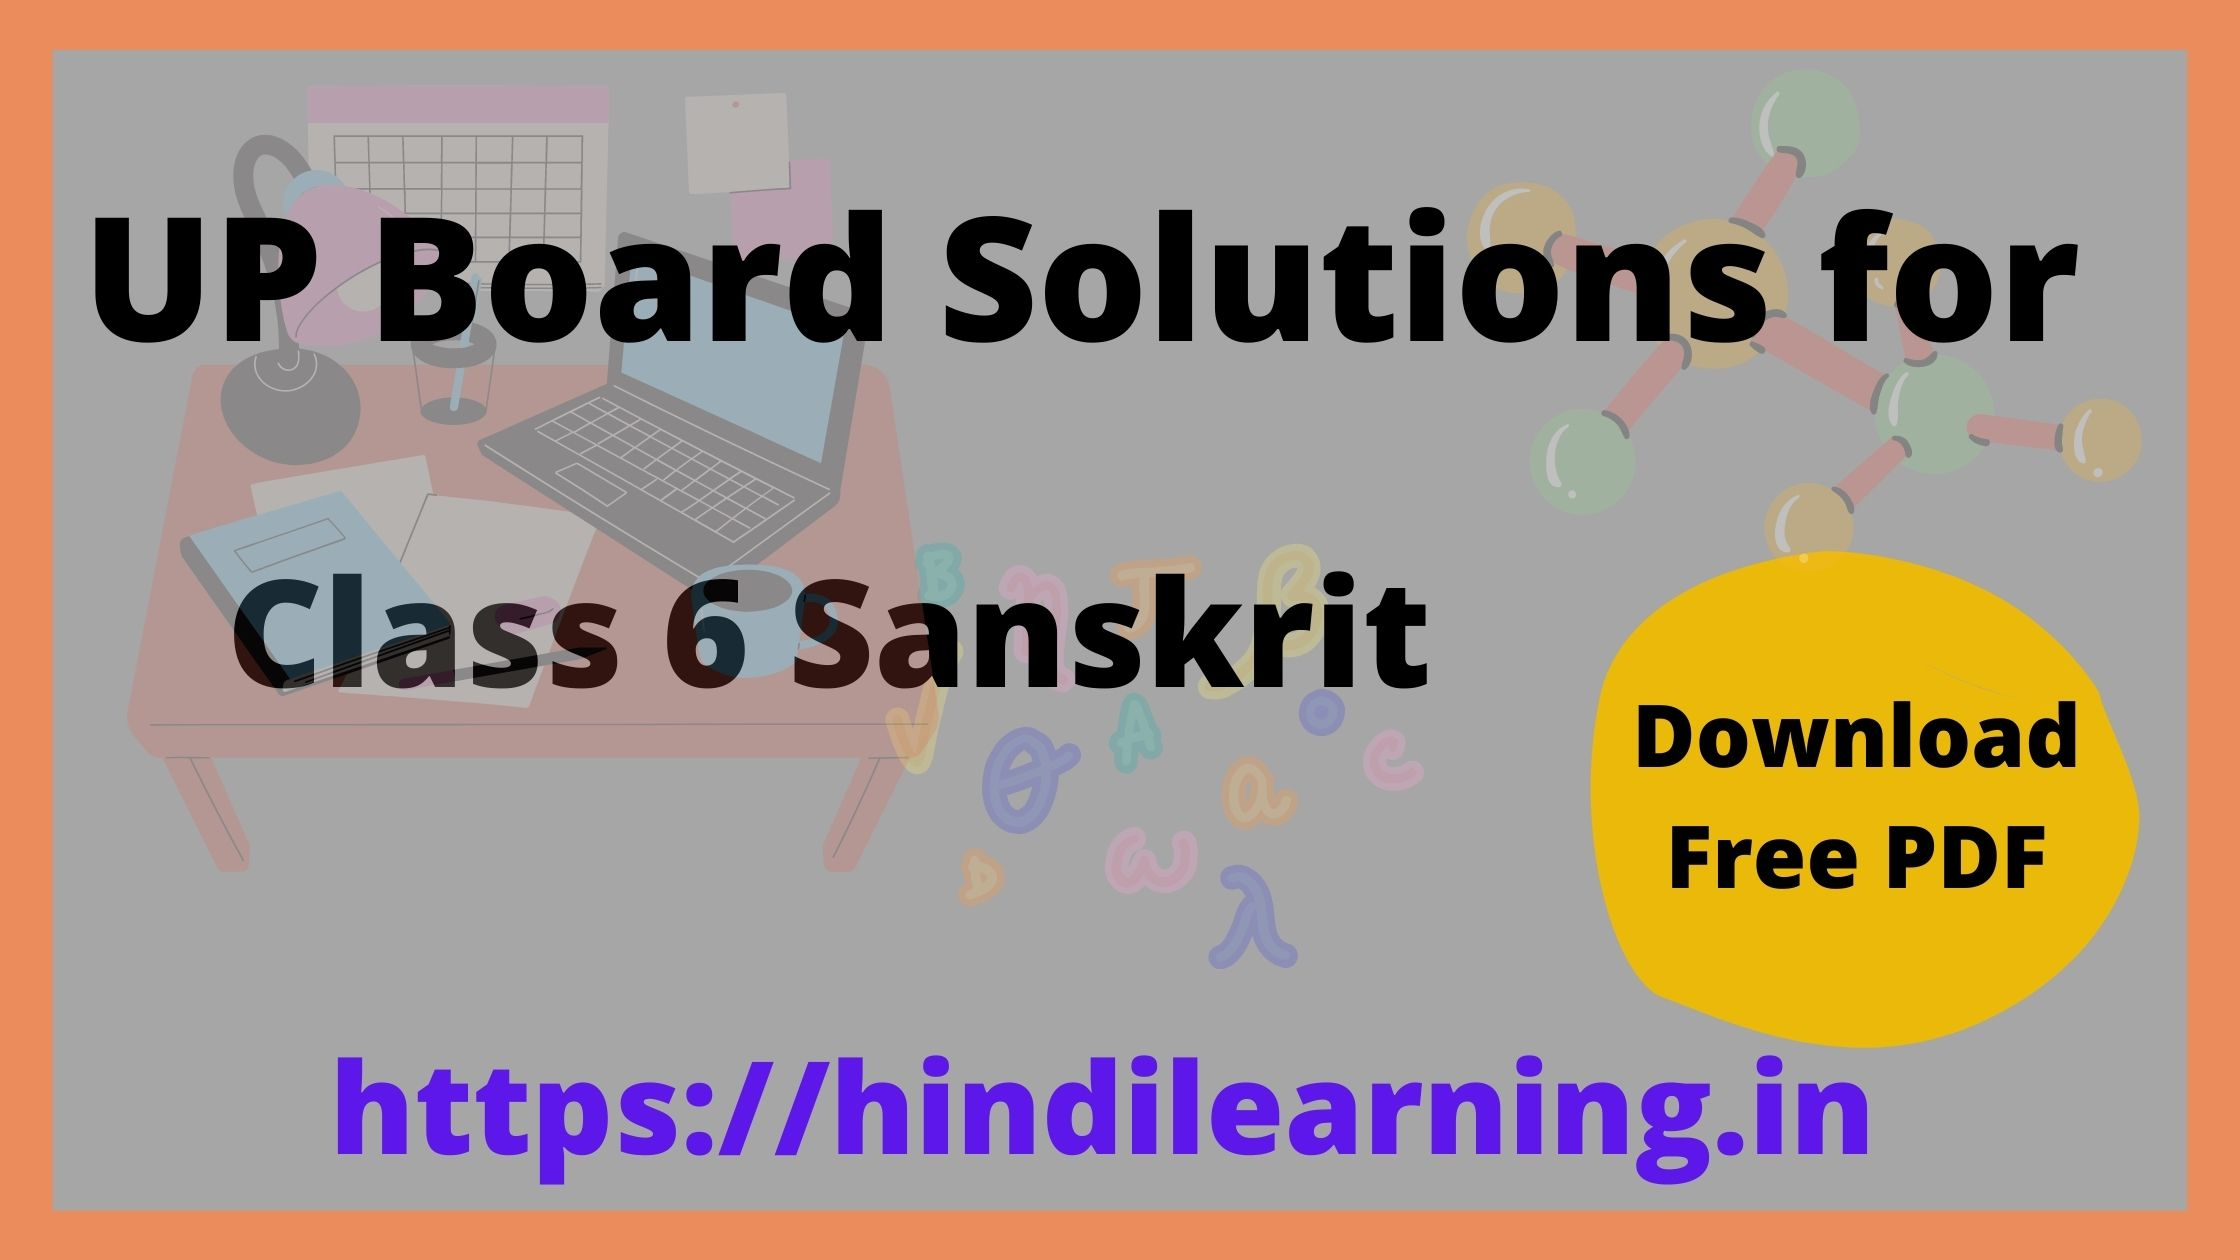 UP Board Solutions for Class 6 Sanskrit ( संस्कृत पीयूषम् )